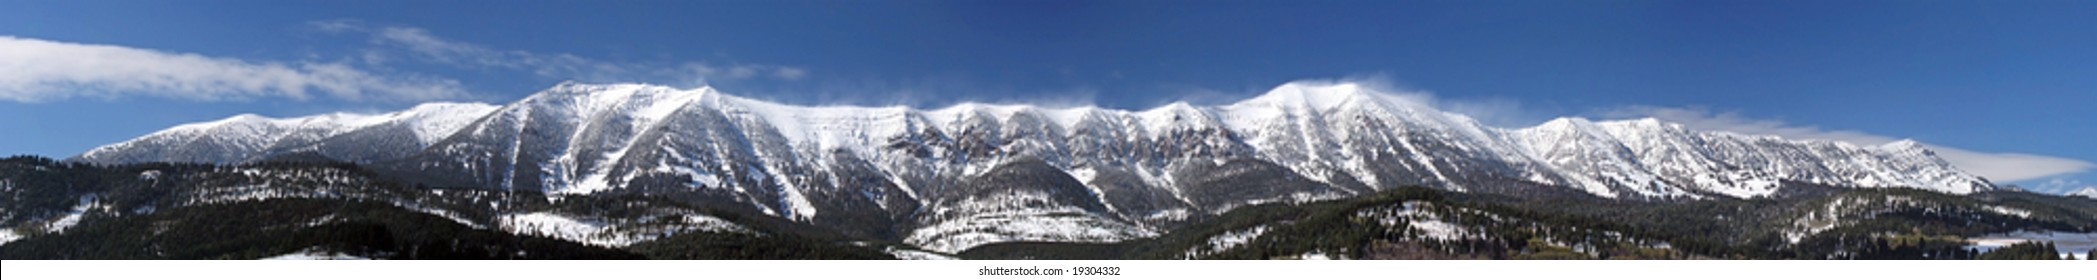 The Bridger Mountains Panorama